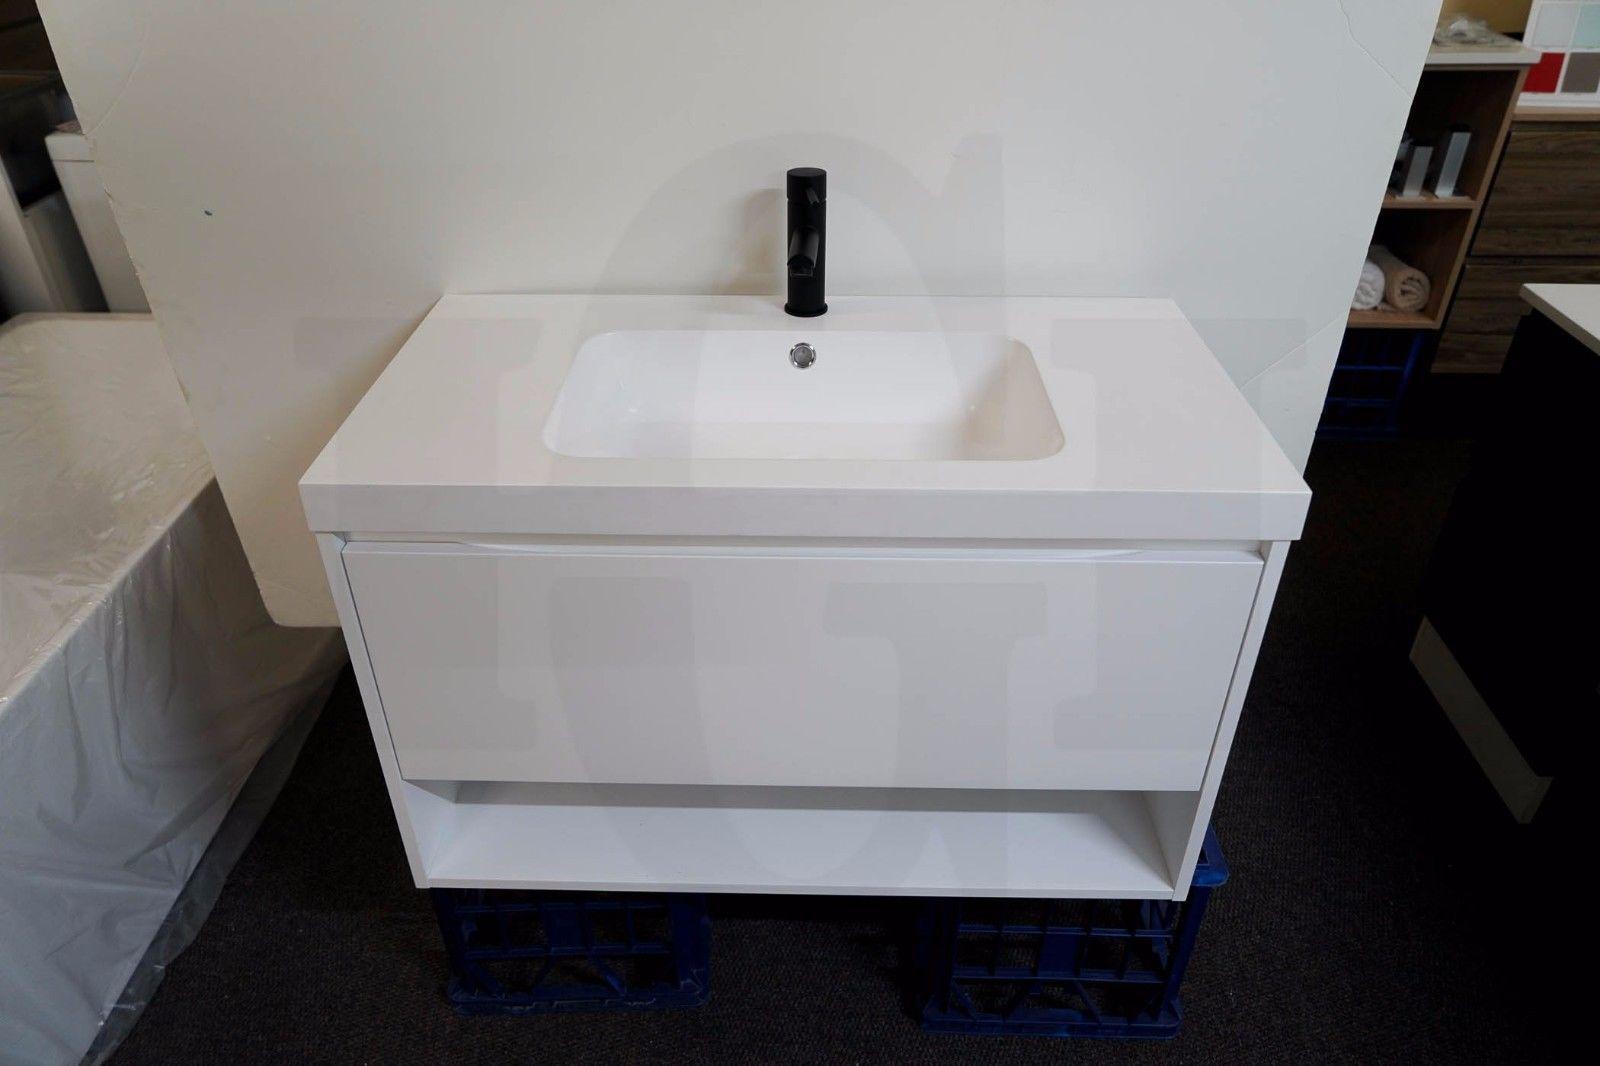 Eden 900mm Matte White Polyurethane Wall Hung Bathroom